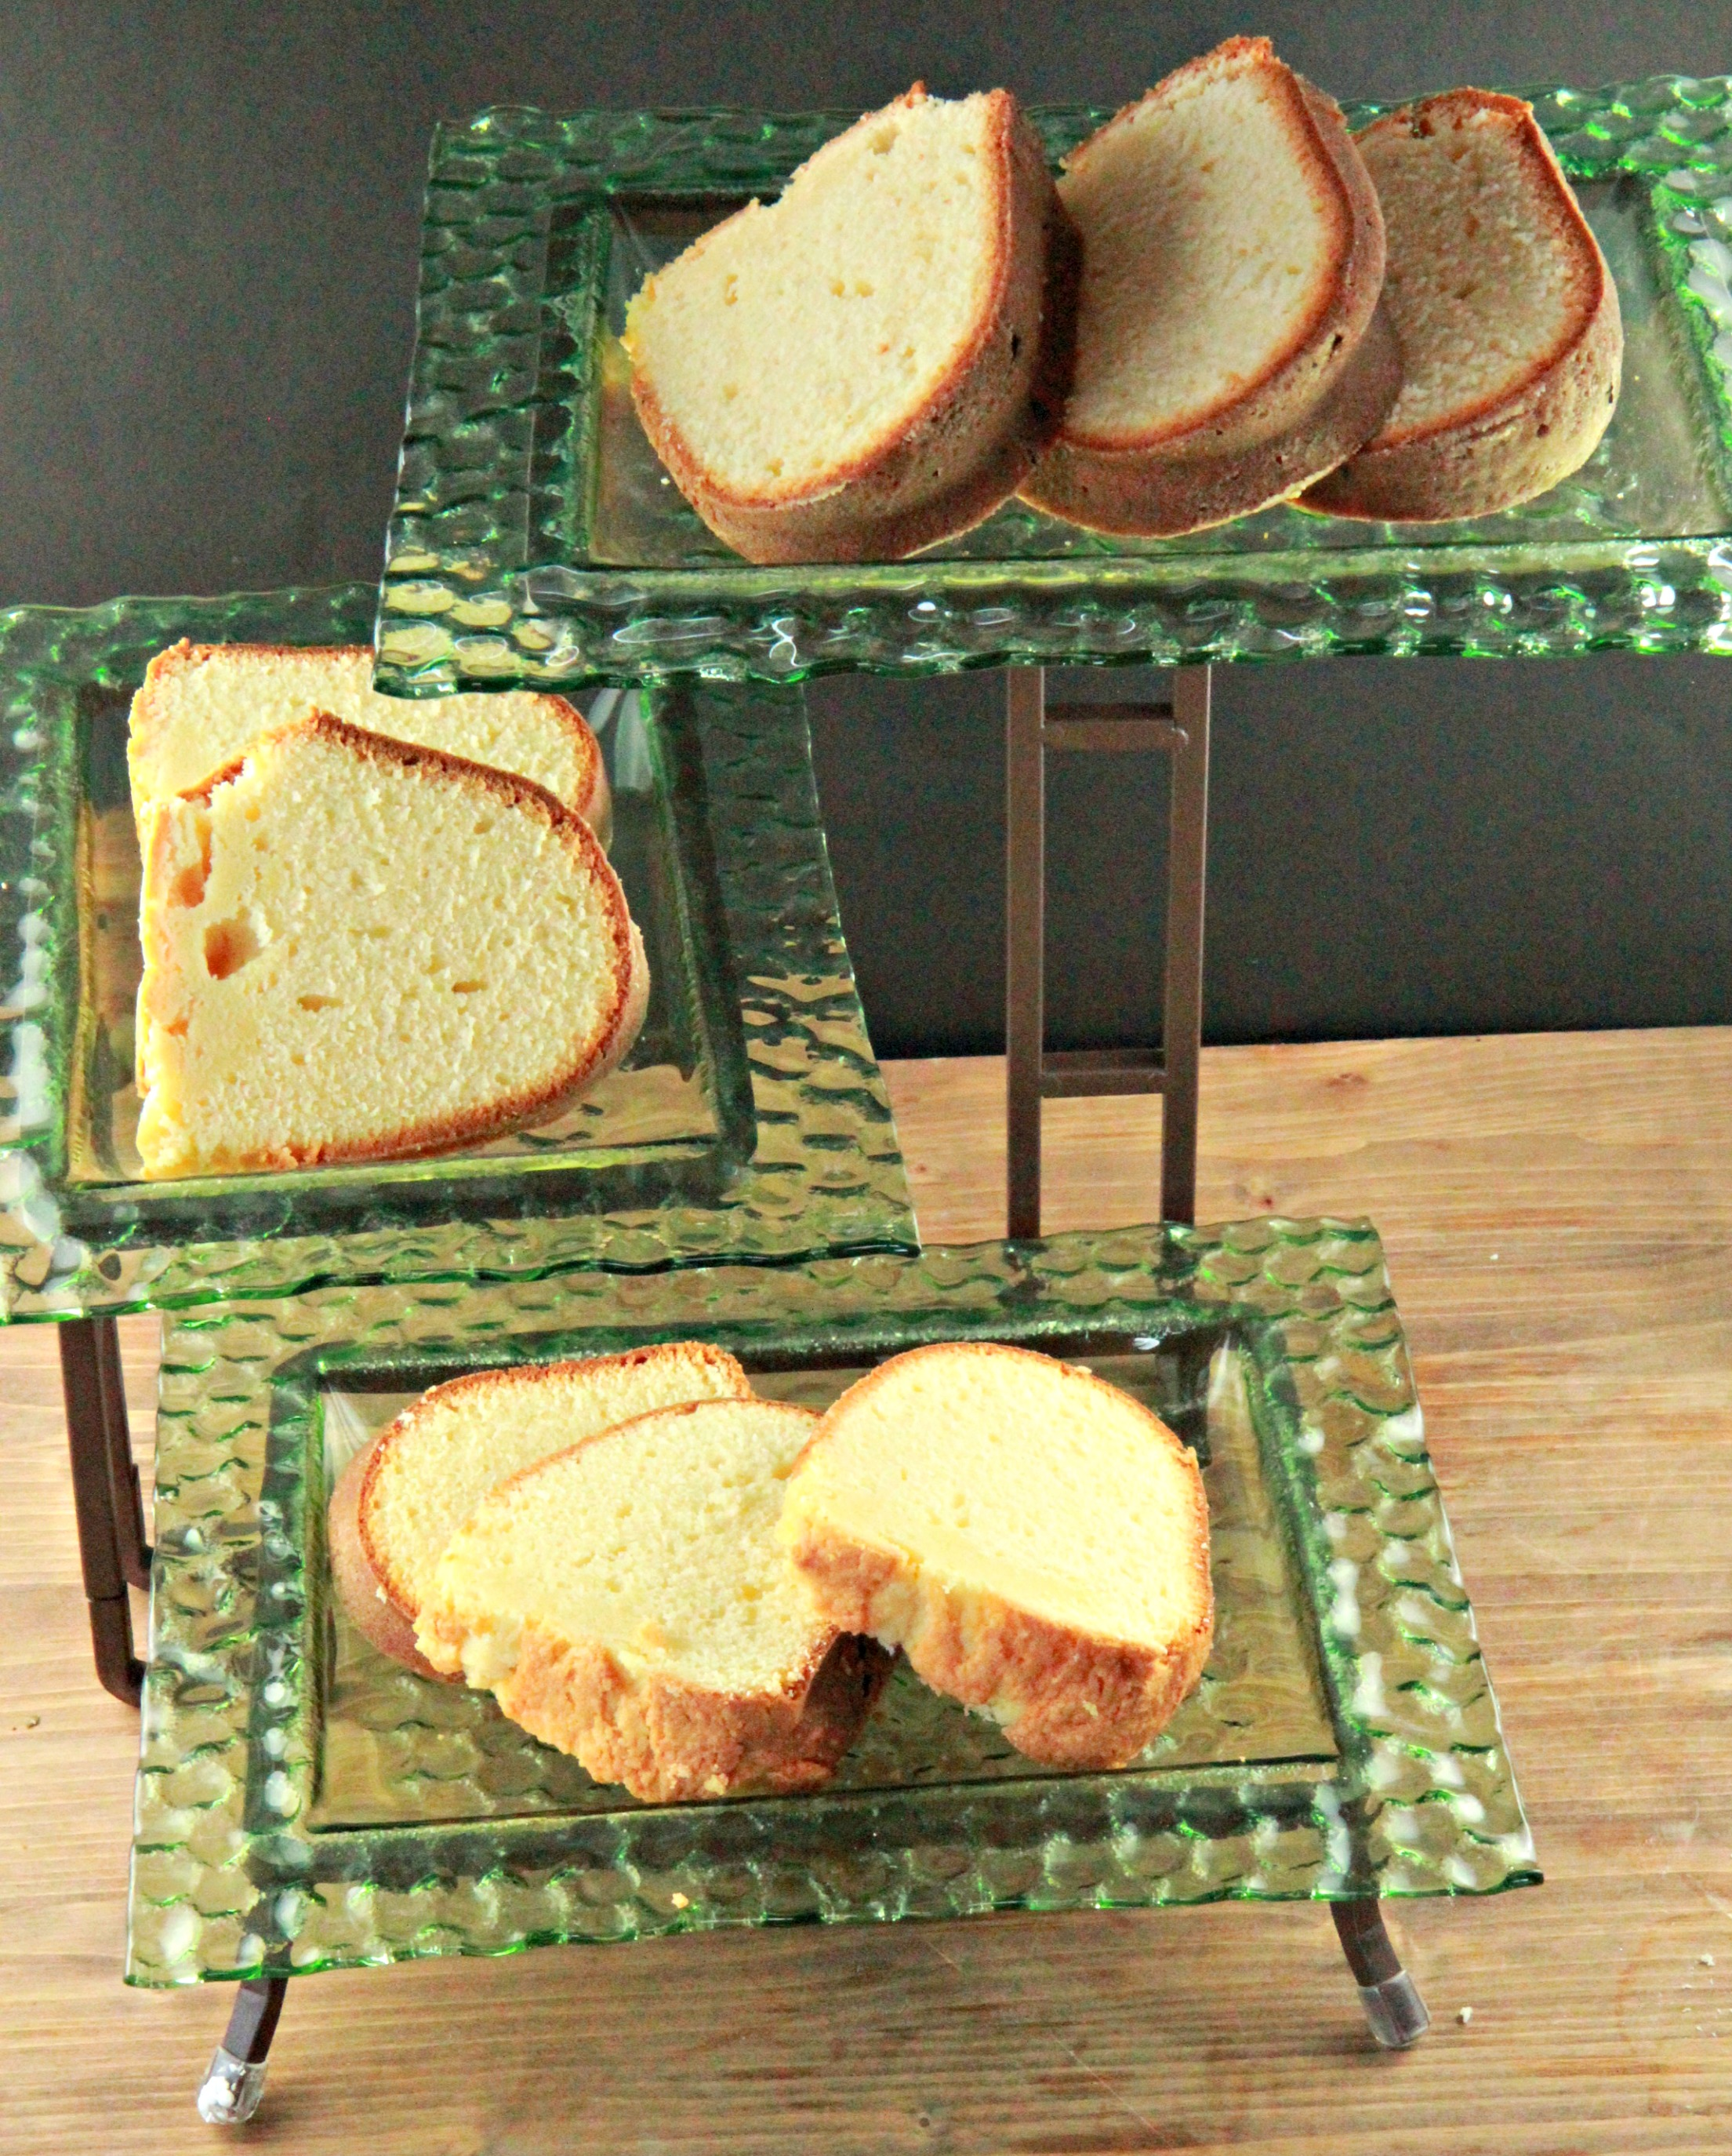 Best-Ever Pound Cake